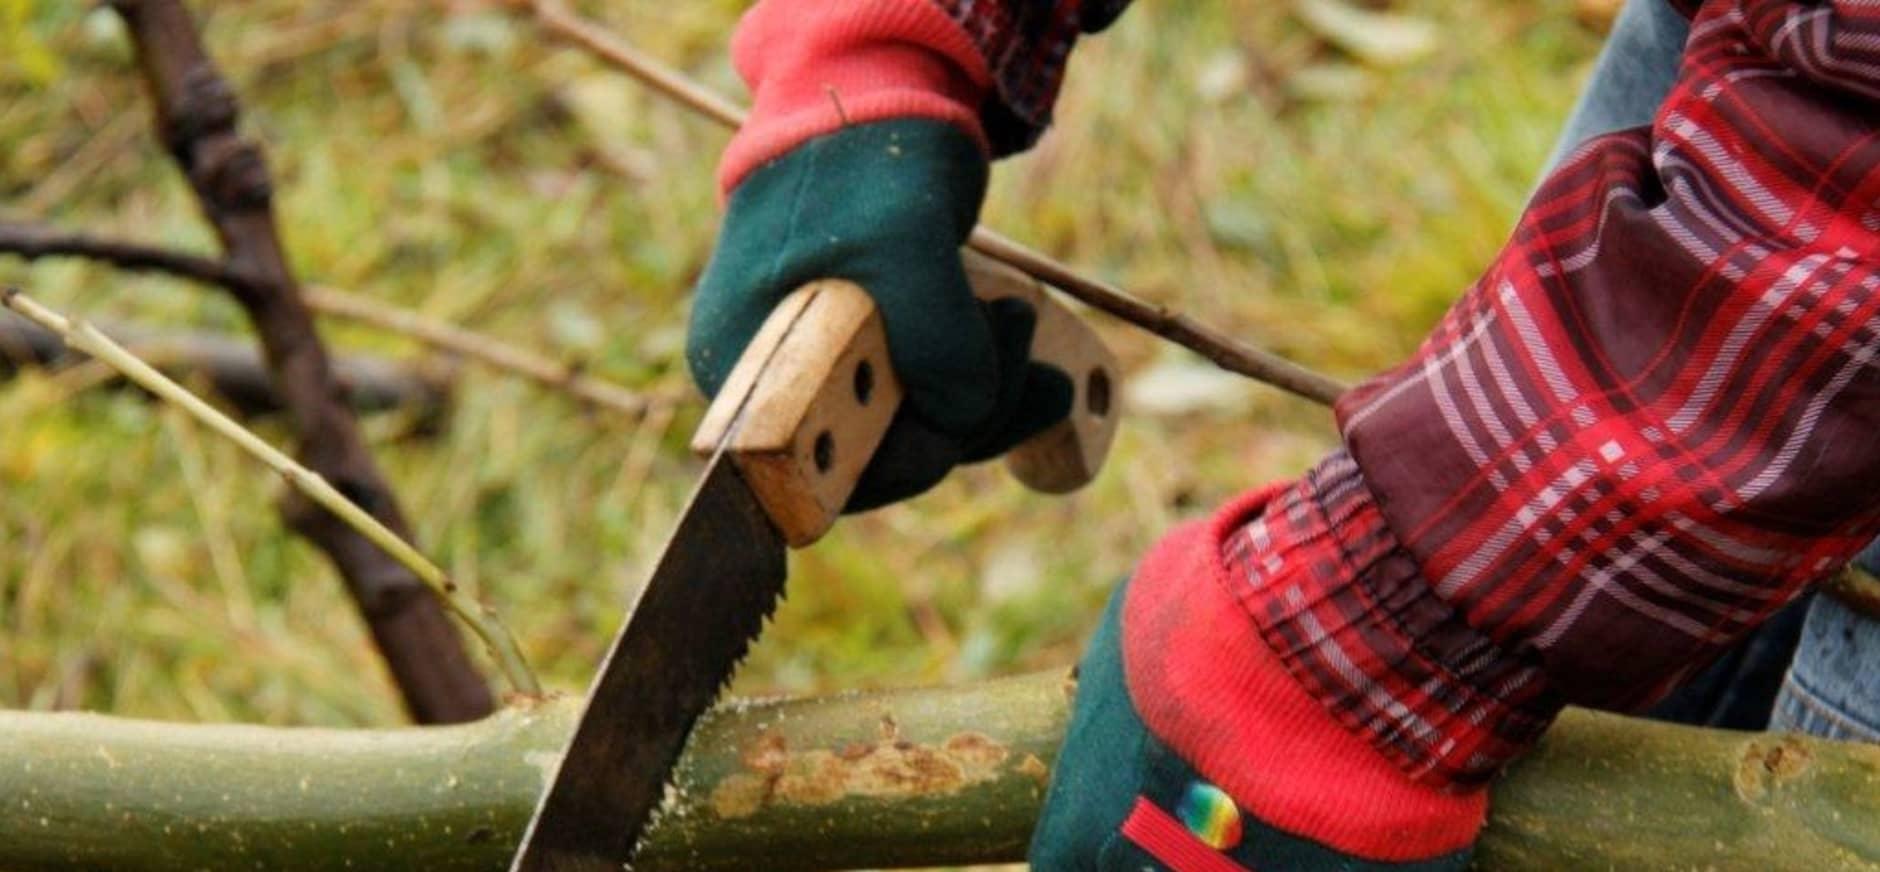 Natuurwerkdag 5 november: Doe mee in de Leuvenumse bossen